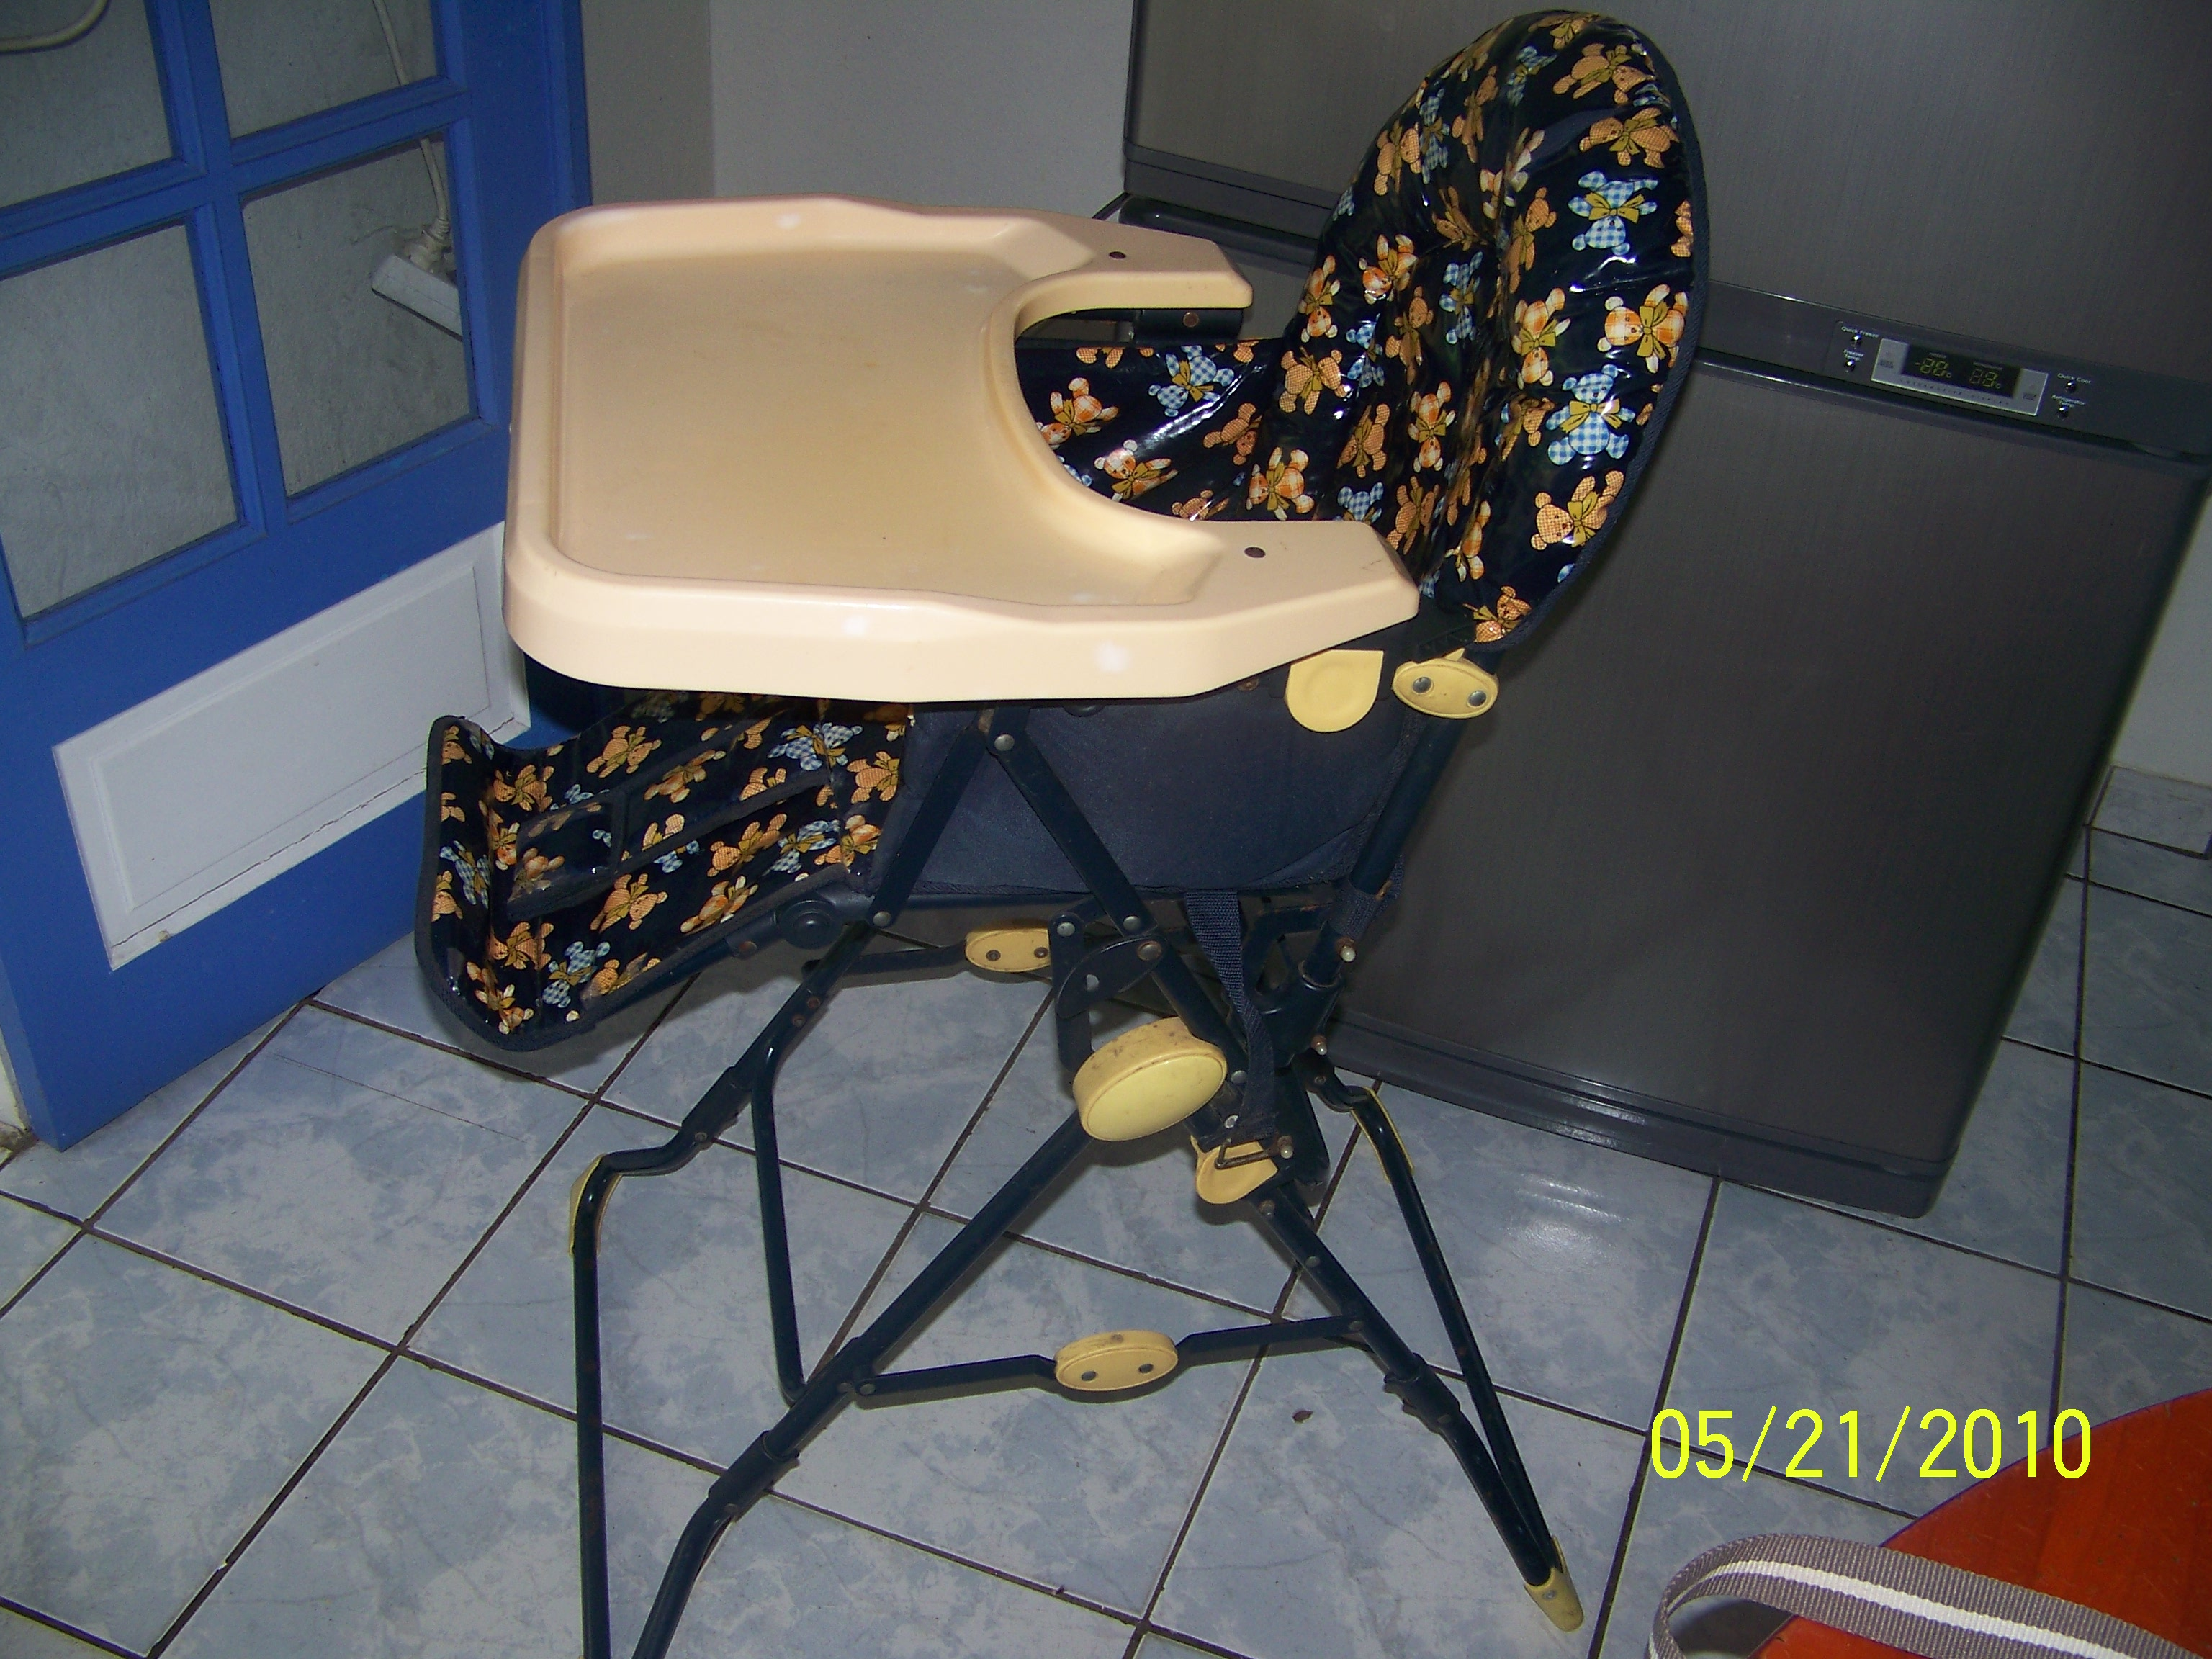 chaise haute bebe 25 euros